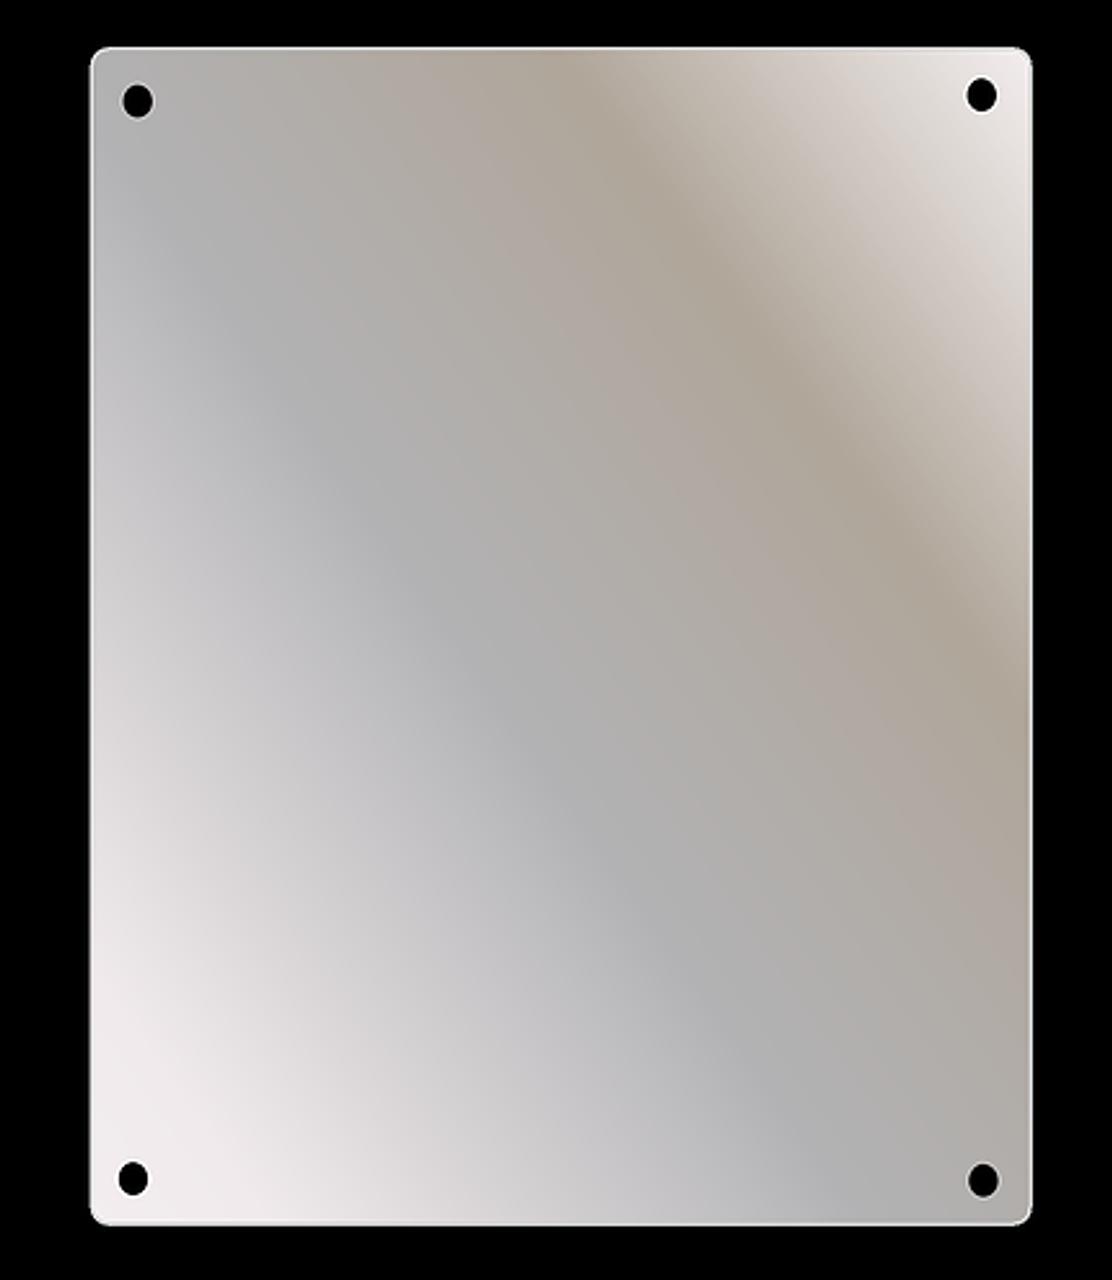 Ketcham Washroom Mirrors Series - Wall Mount Stainless Steel Mirror